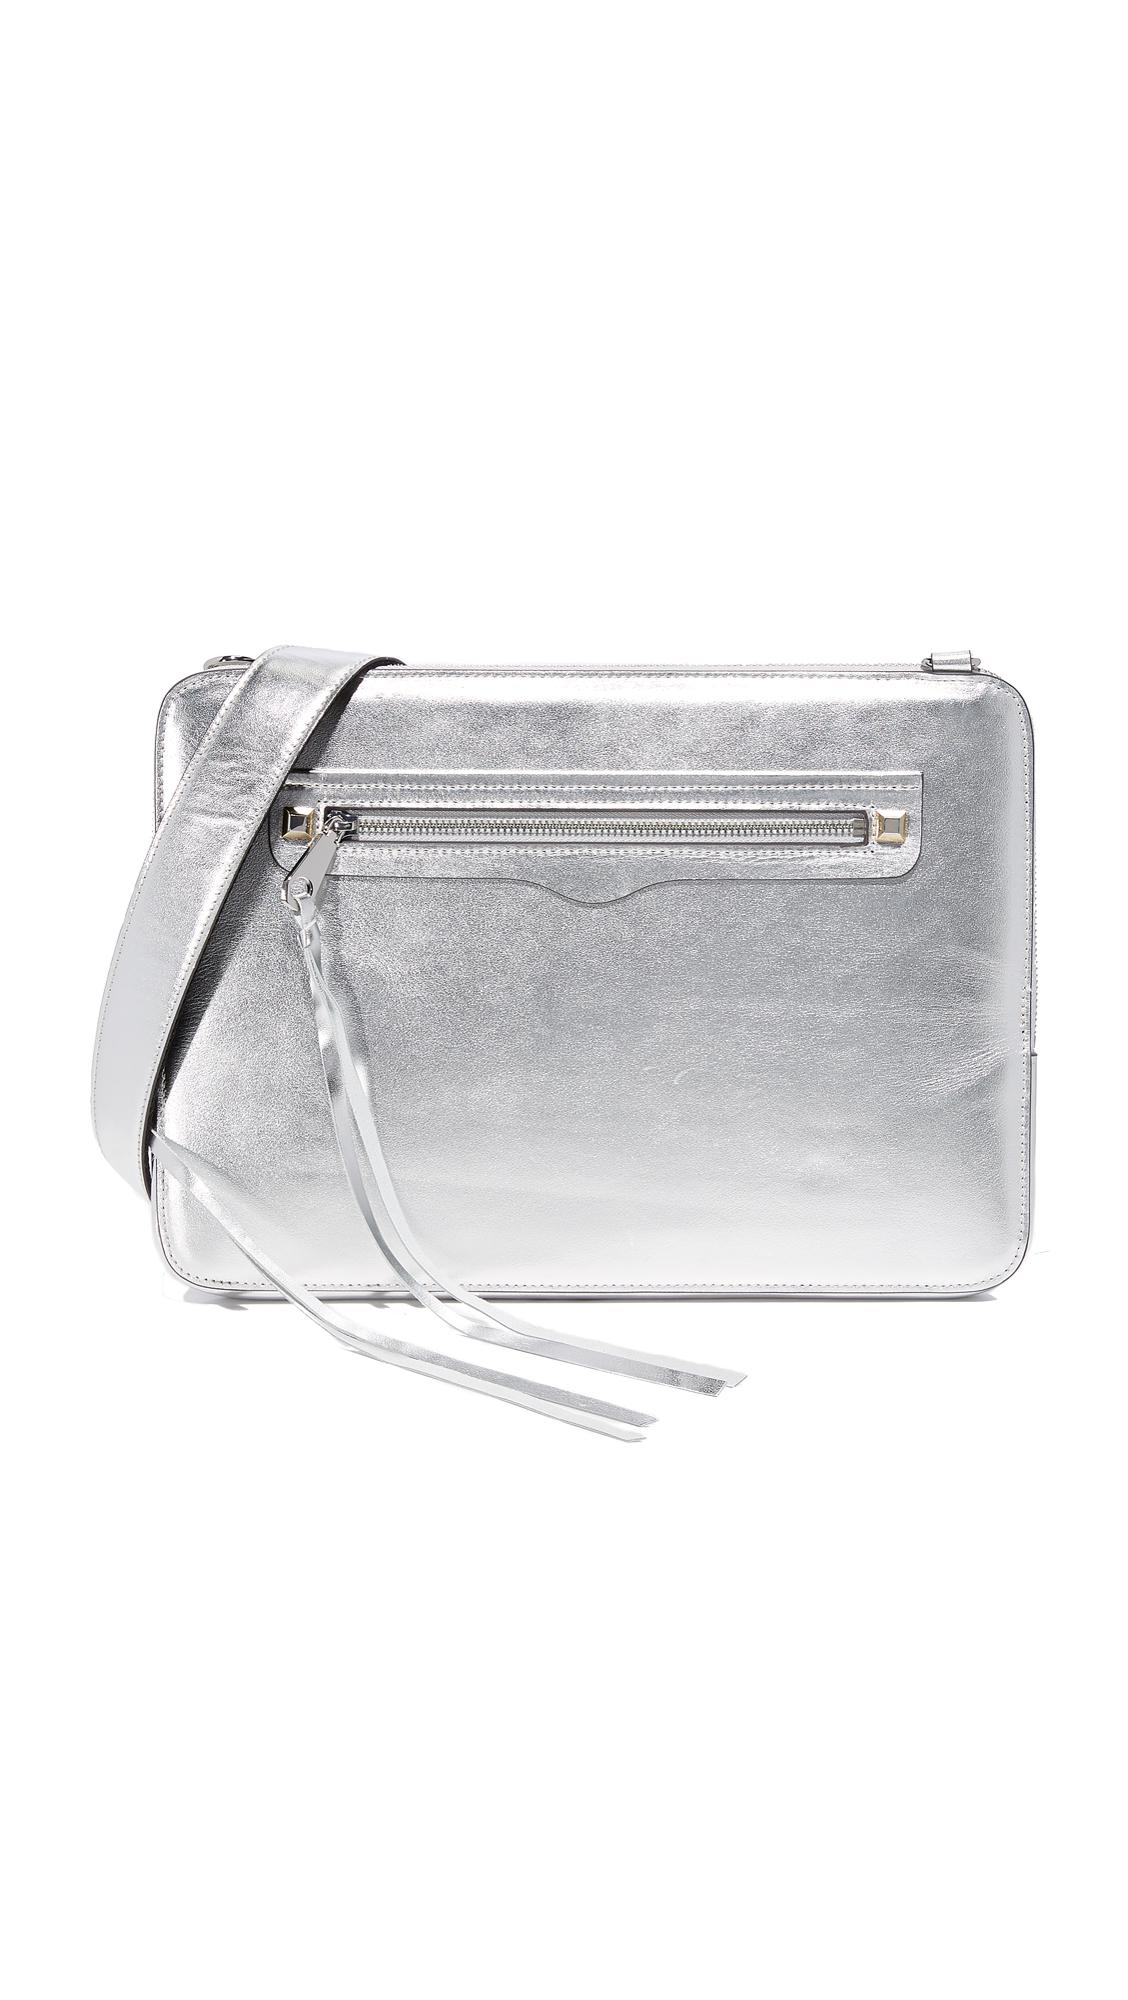 Rebecca Minkoff Regan Sleeve Laptop Case - Metallic Silver